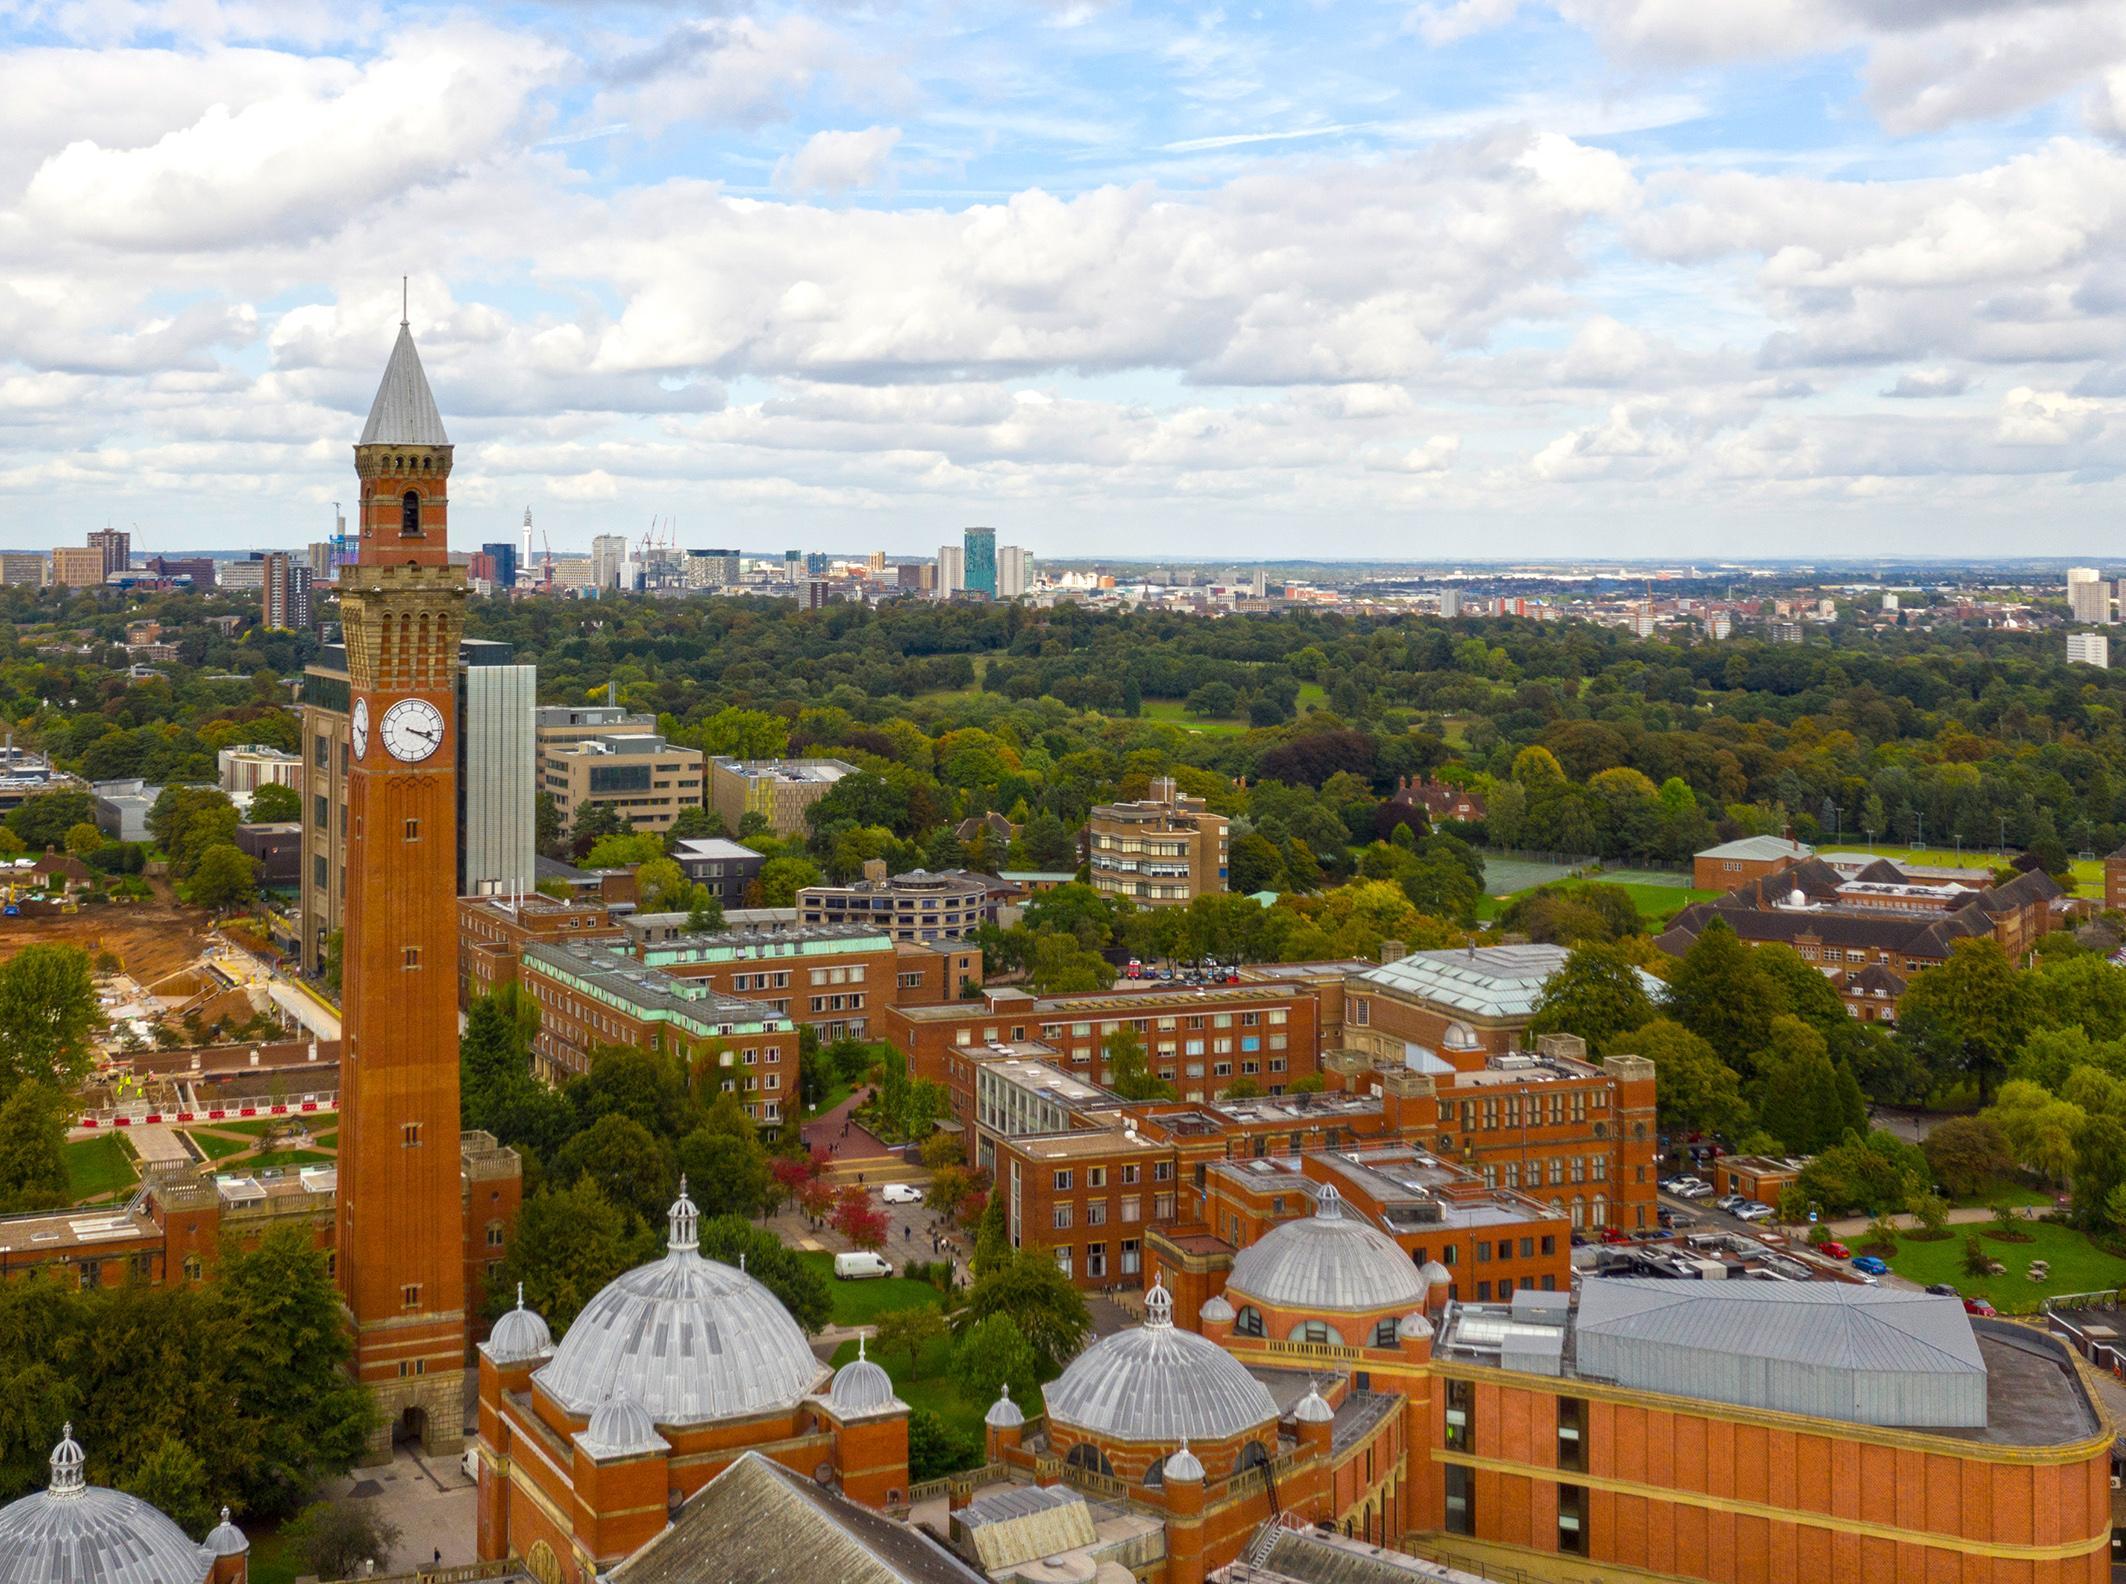 PTSG puts University of Birmingham to the test